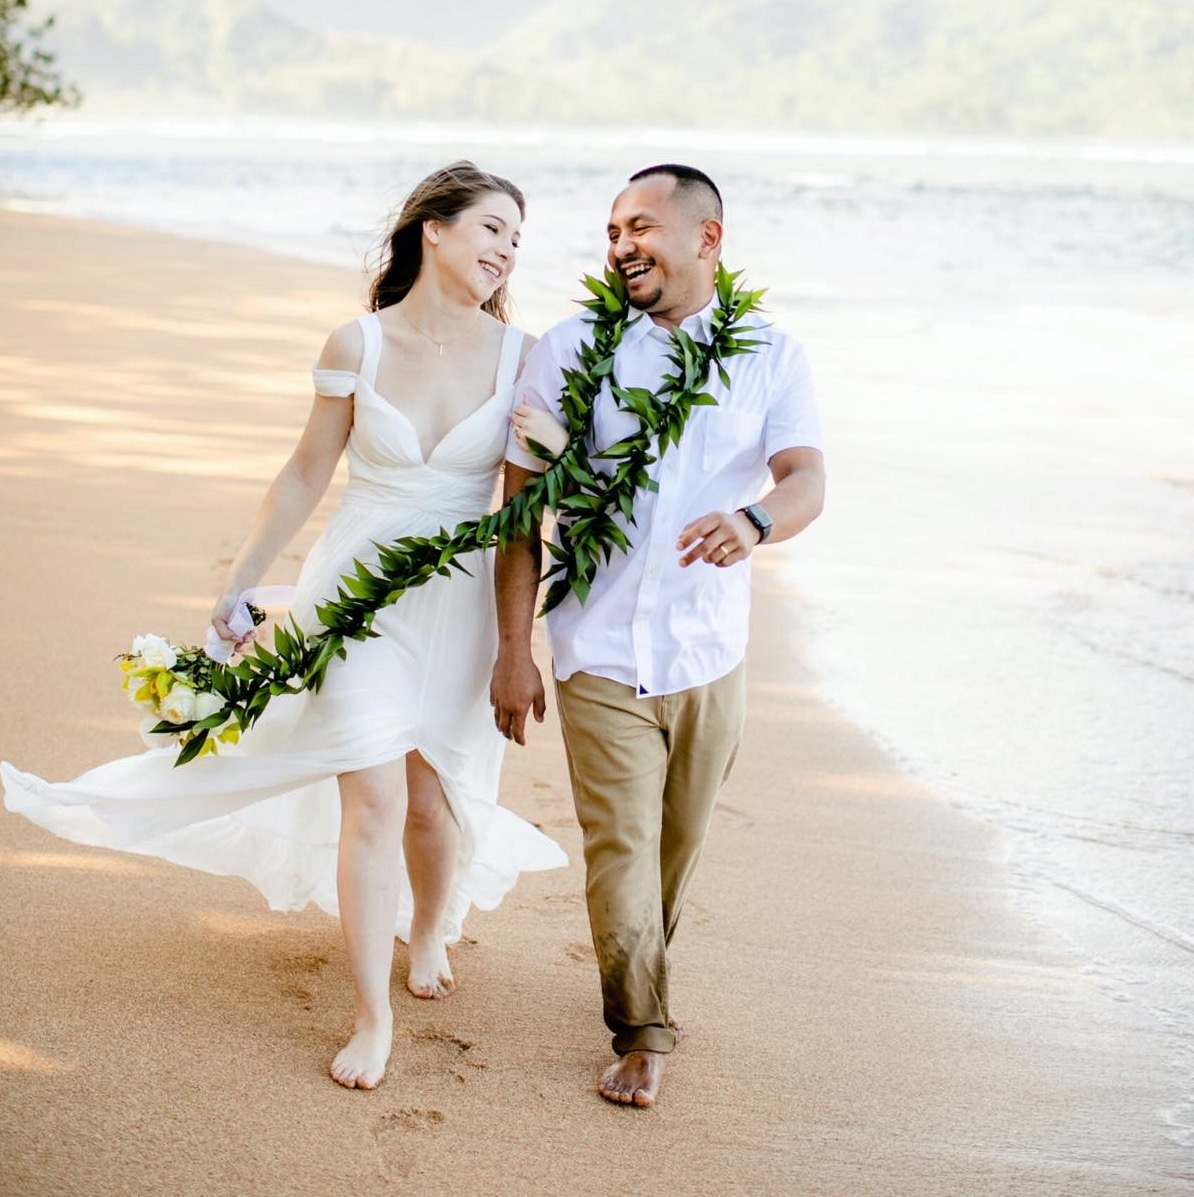 Jaclyn & Dylan walking on the beach in Kauai.